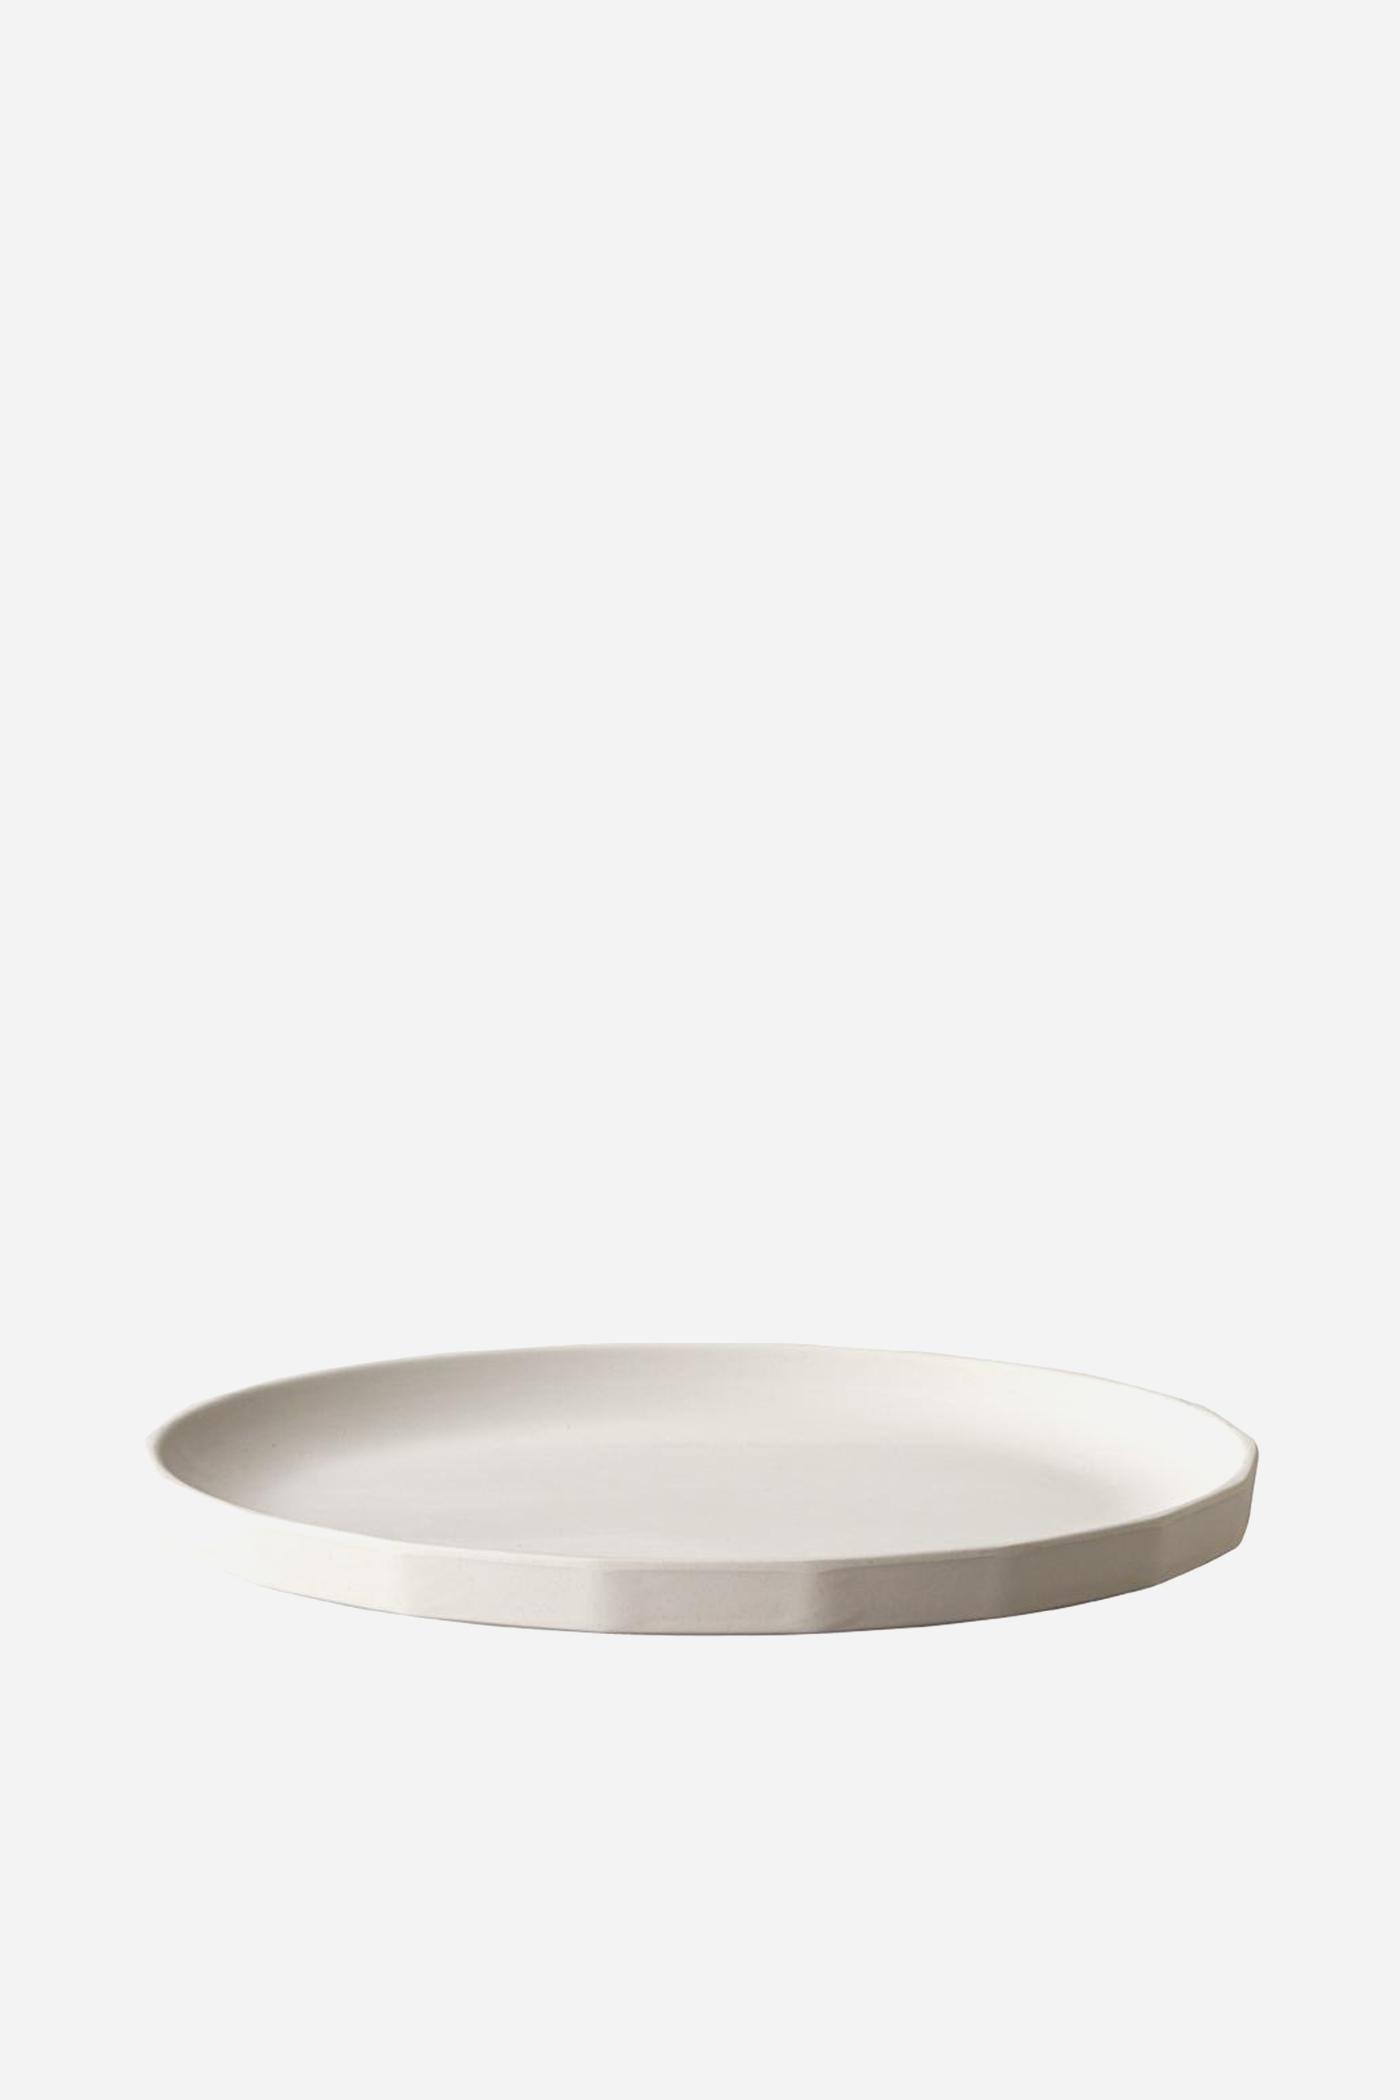 Kinto Alfresco Large Plate